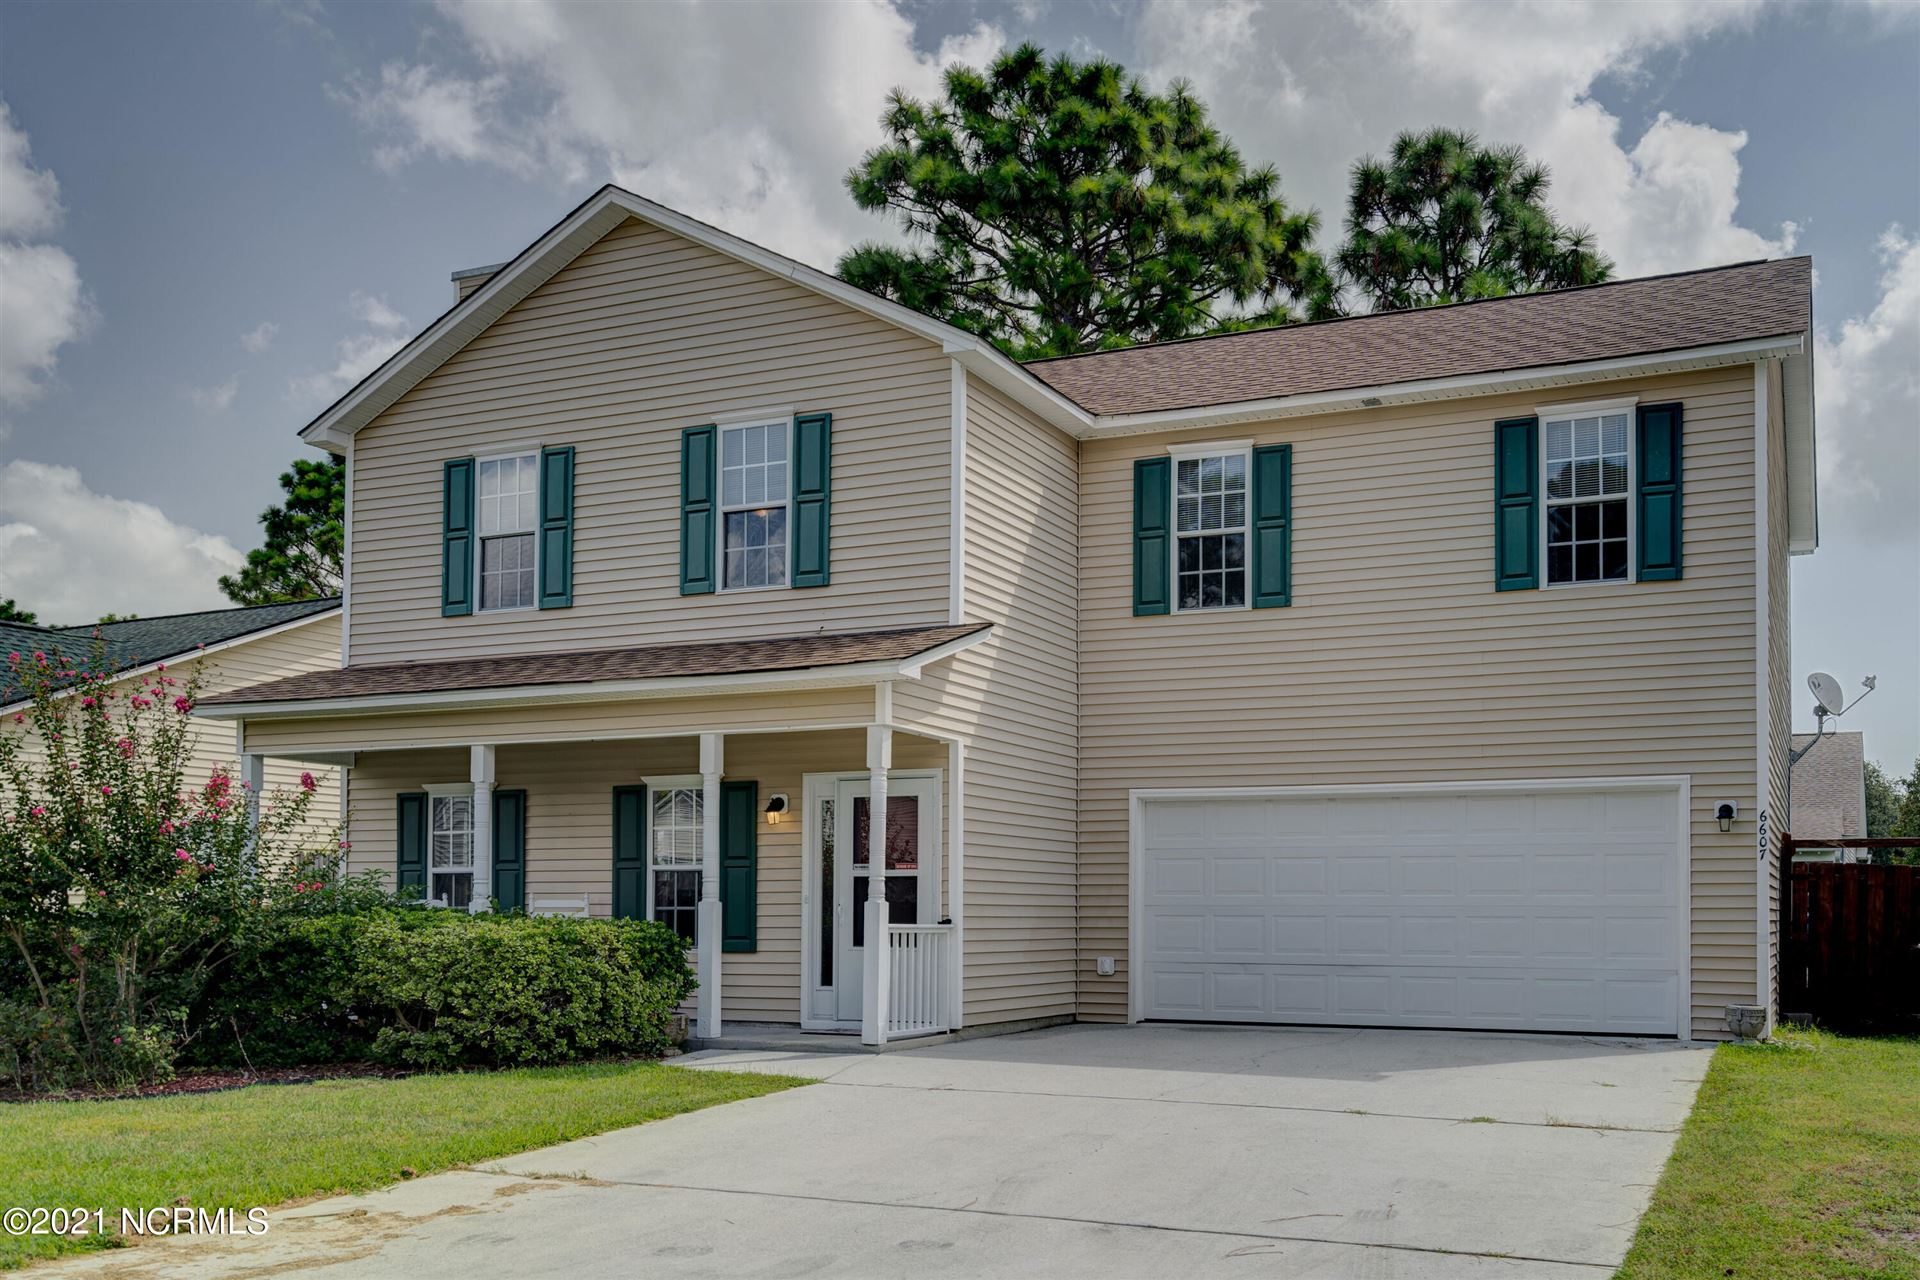 Photo of 6607 Dorrington Drive, Wilmington, NC 28412 (MLS # 100289145)